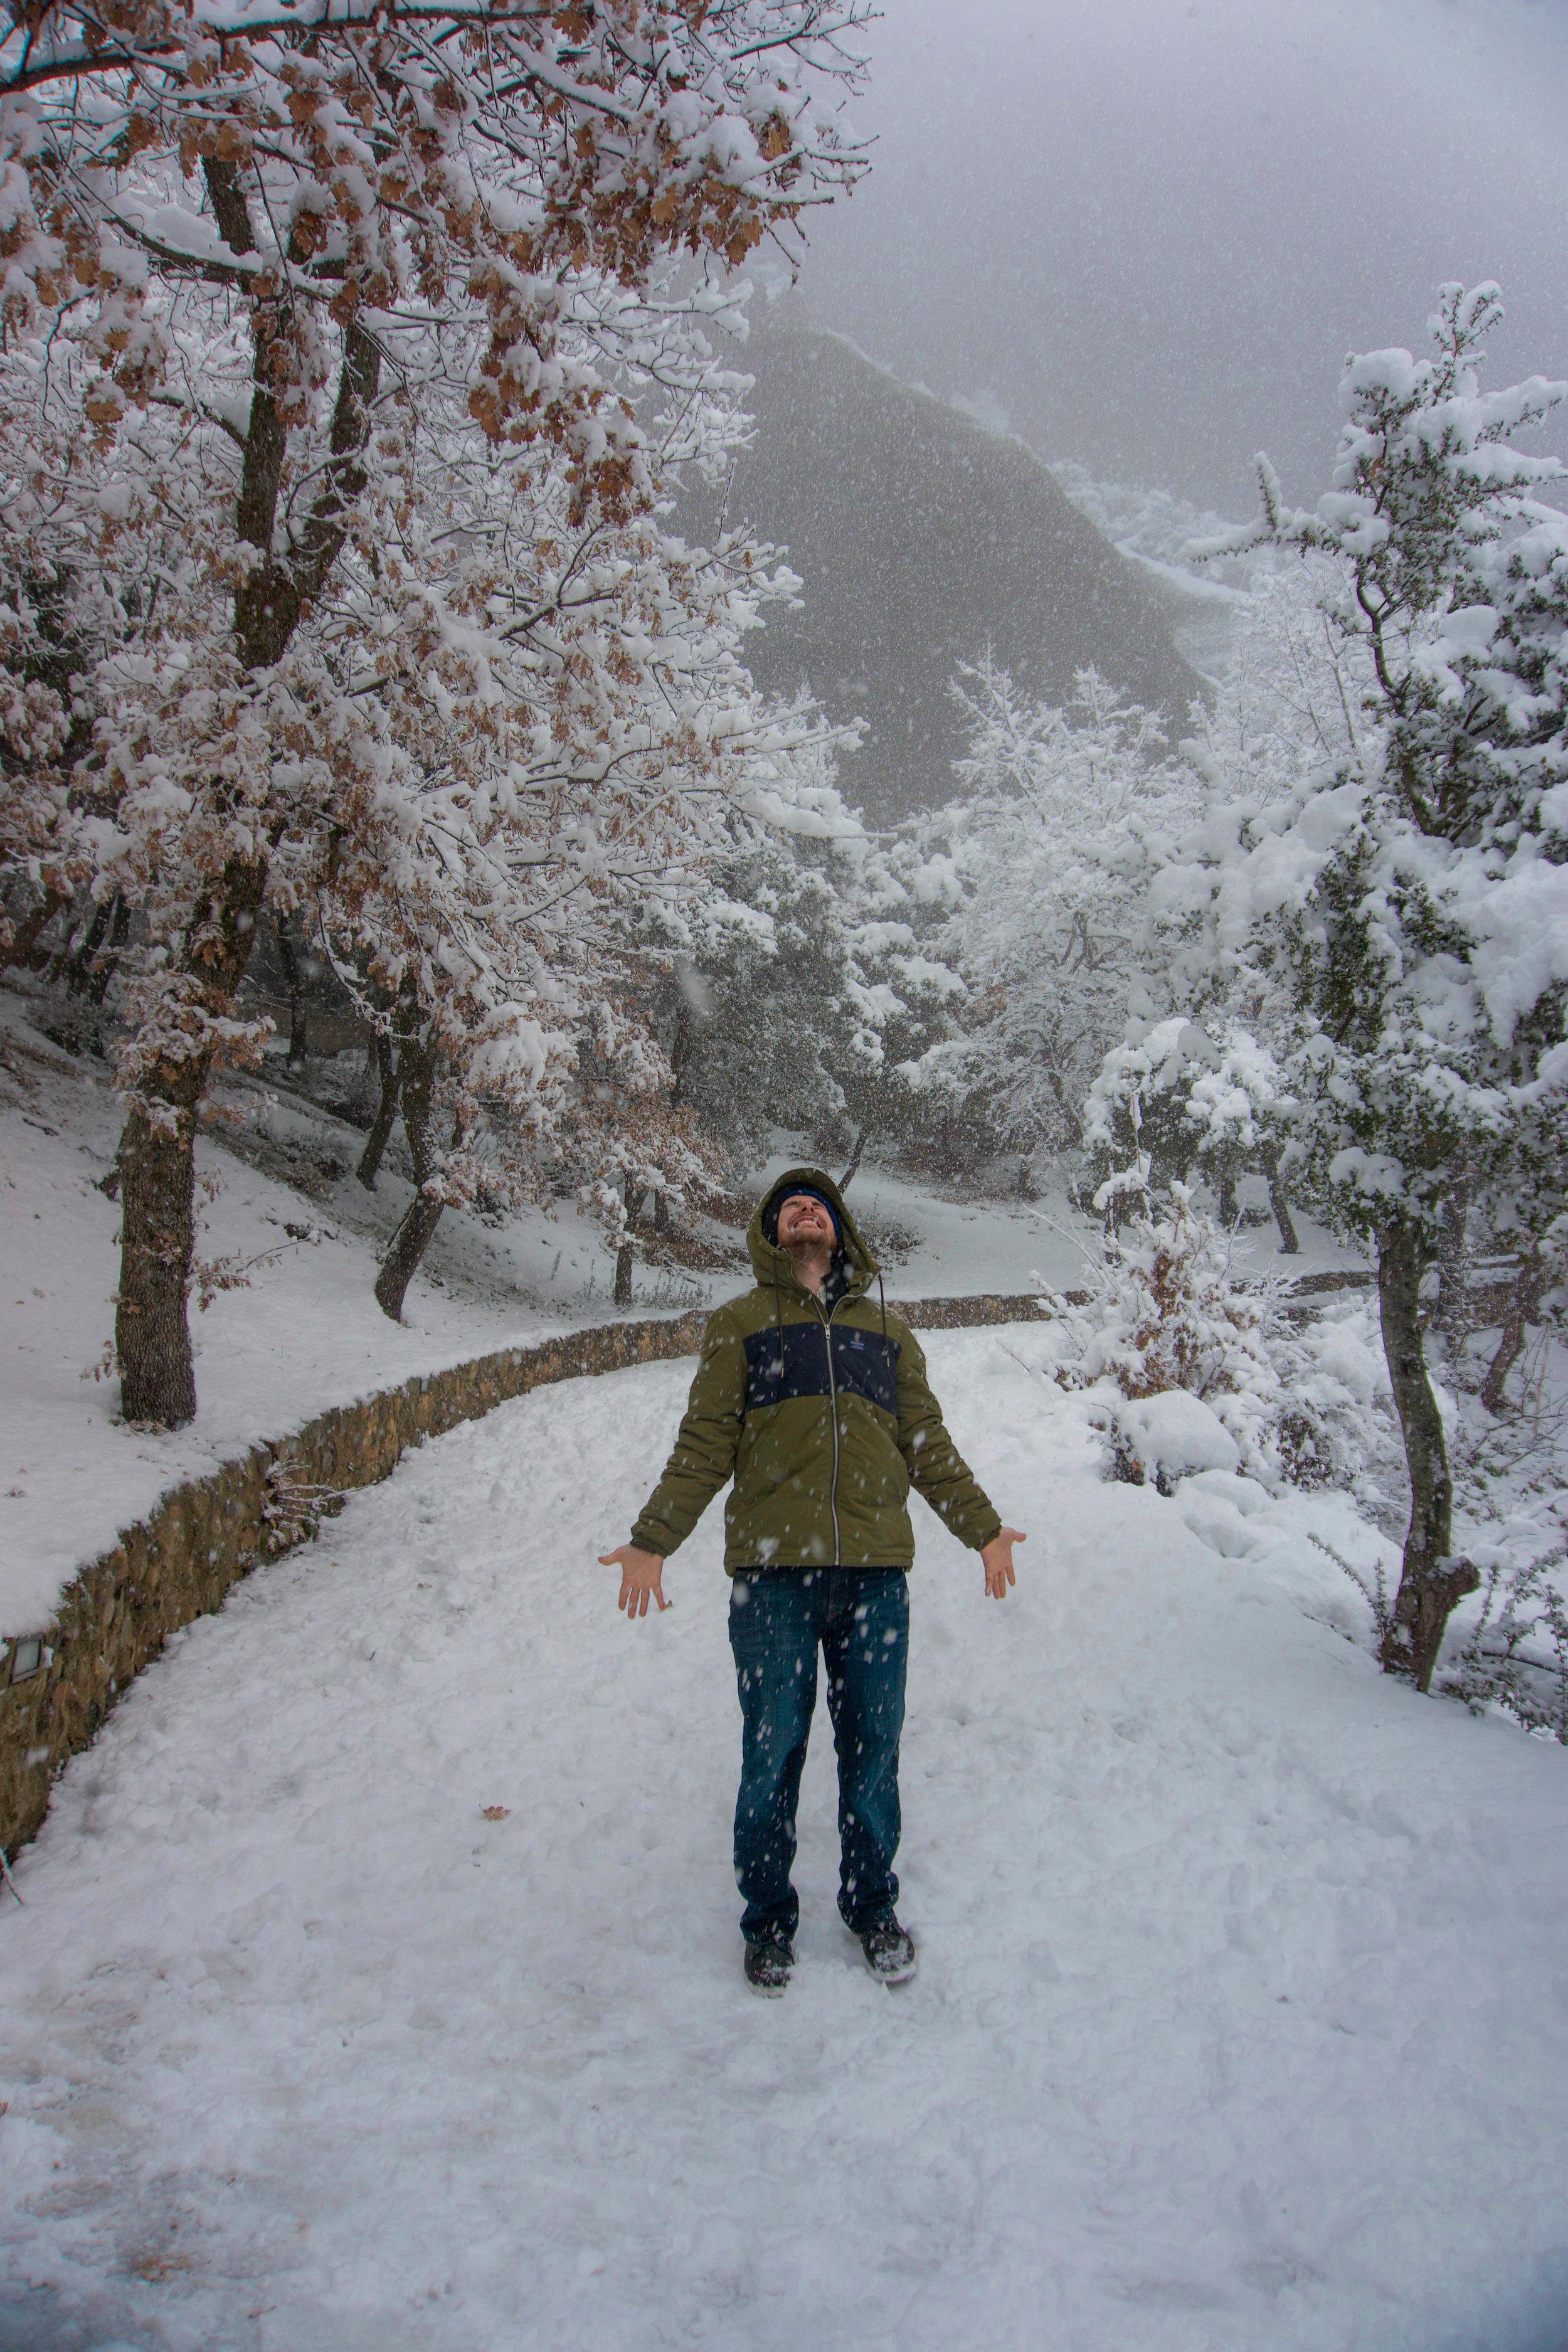 Meteora_05_Snowbunny.JPG